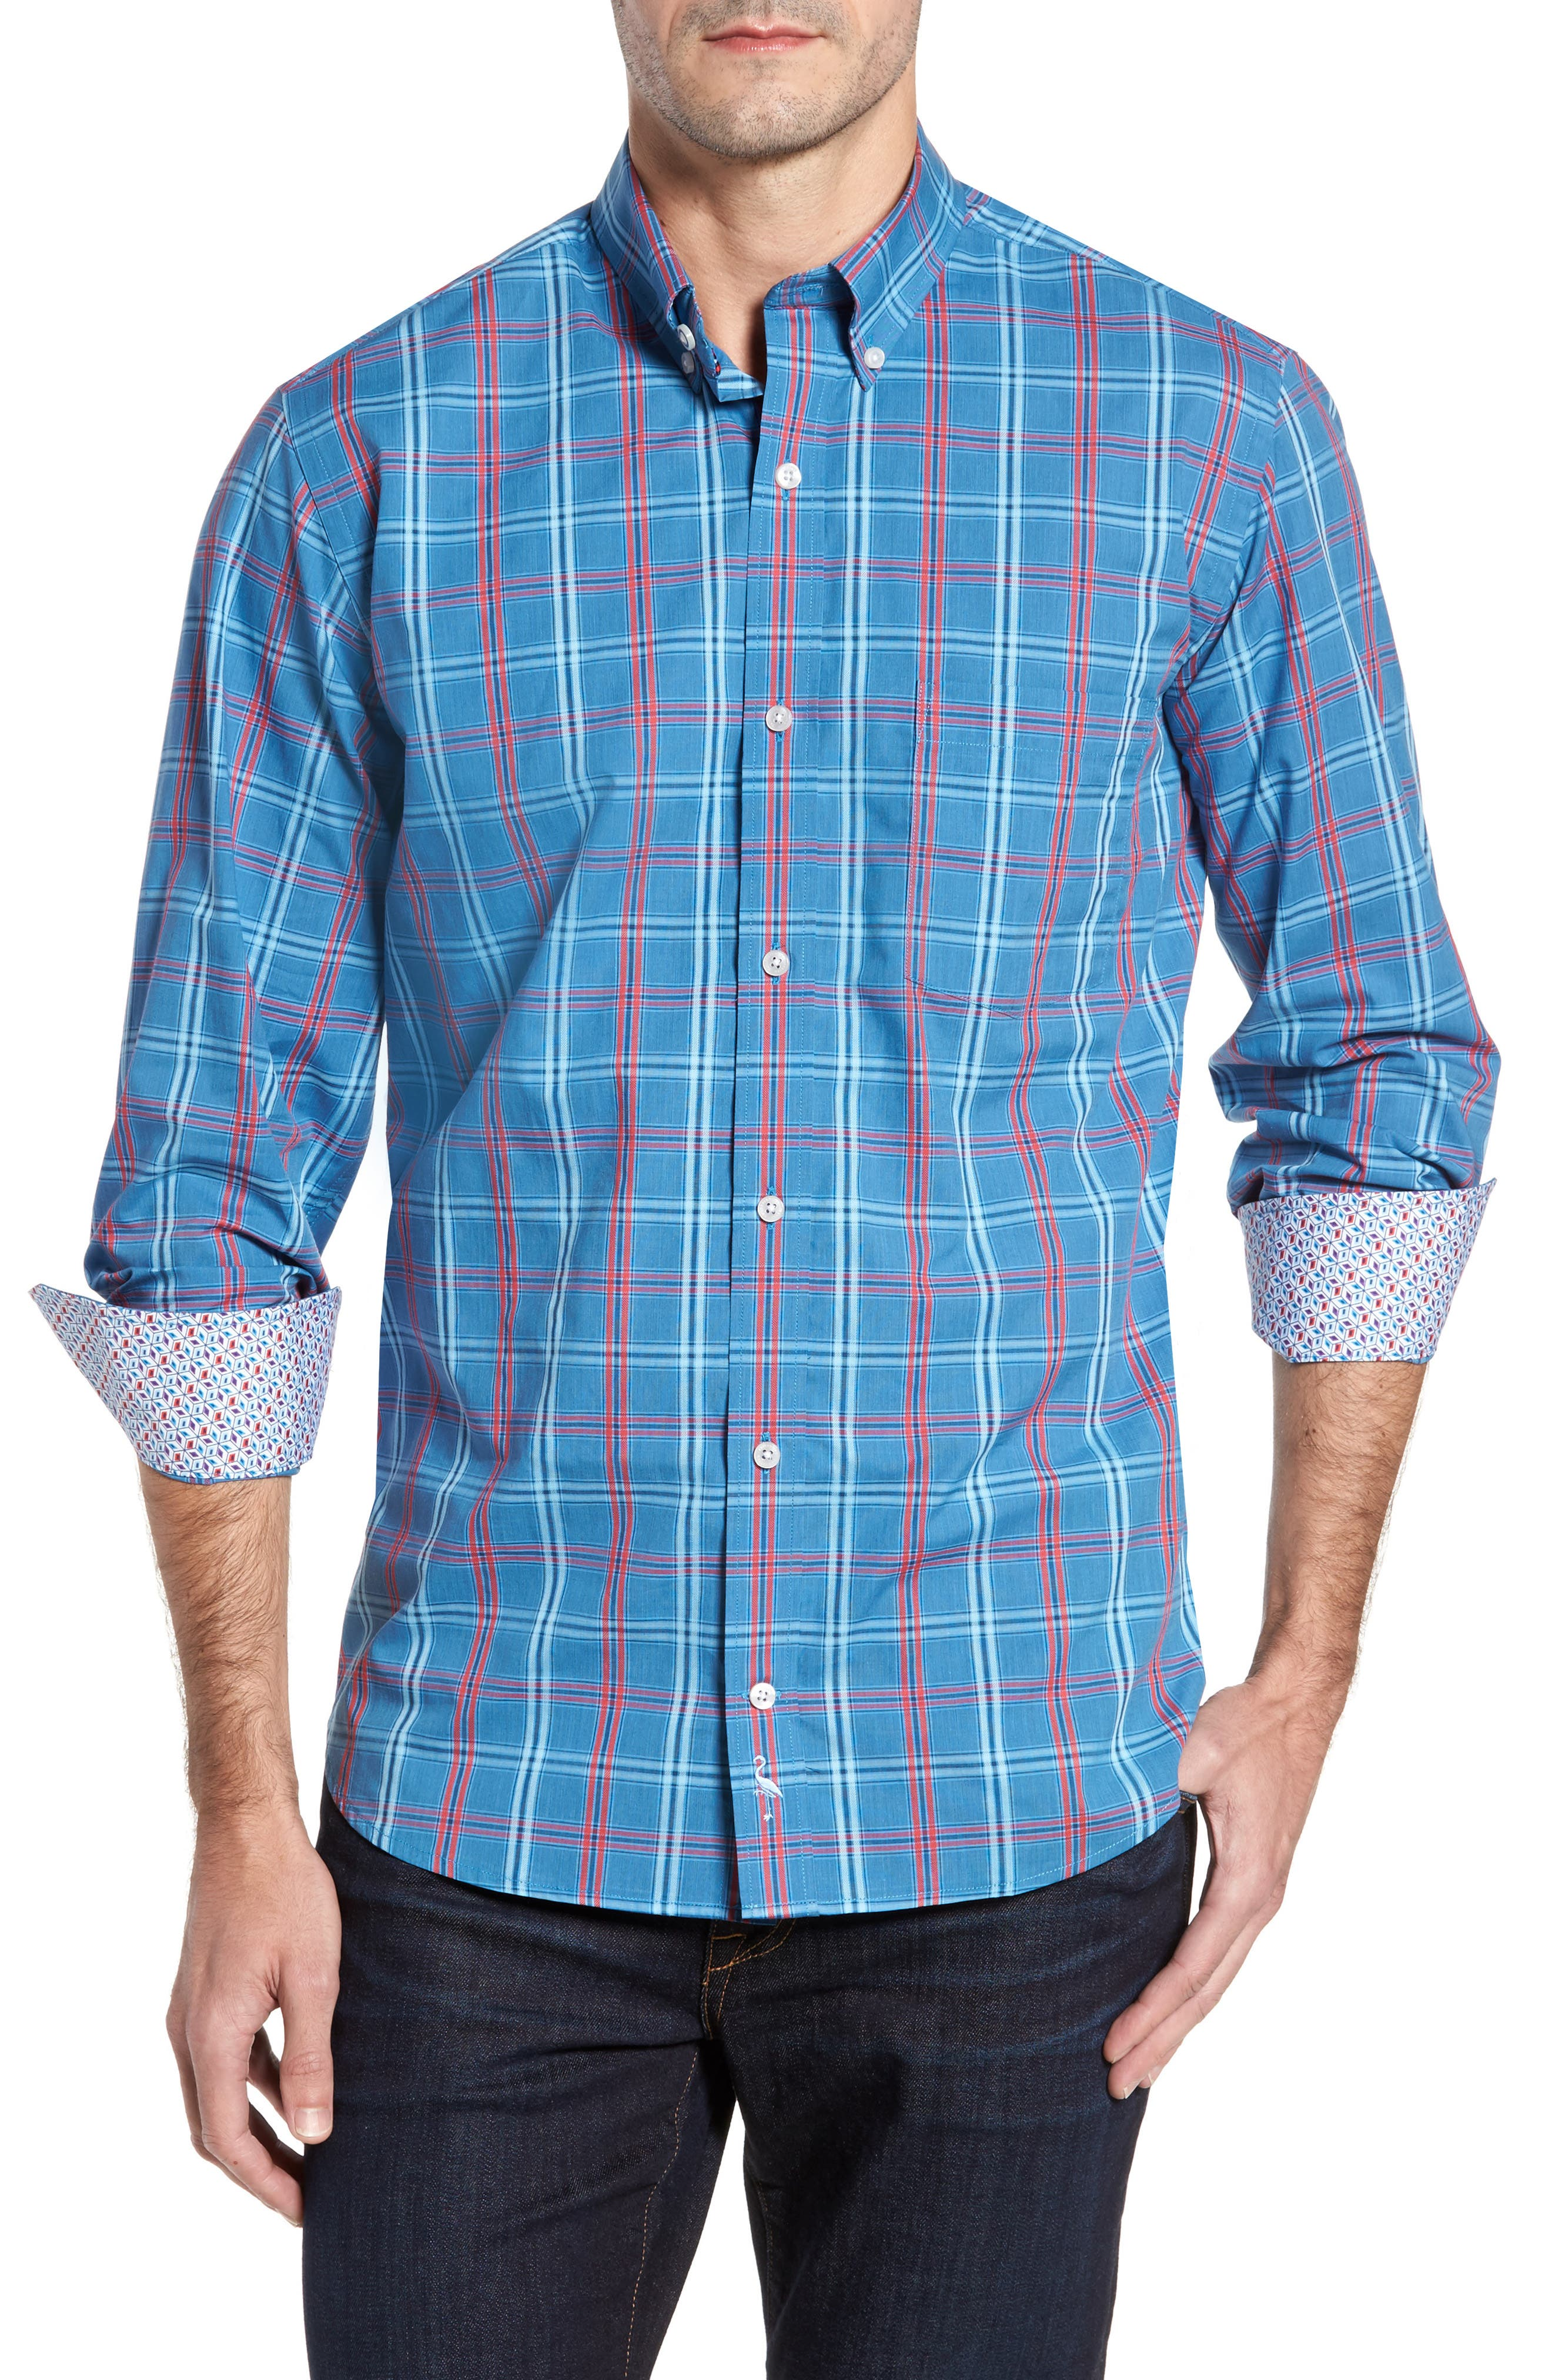 TailorByrd Ashland Windowpane Check Sport Shirt